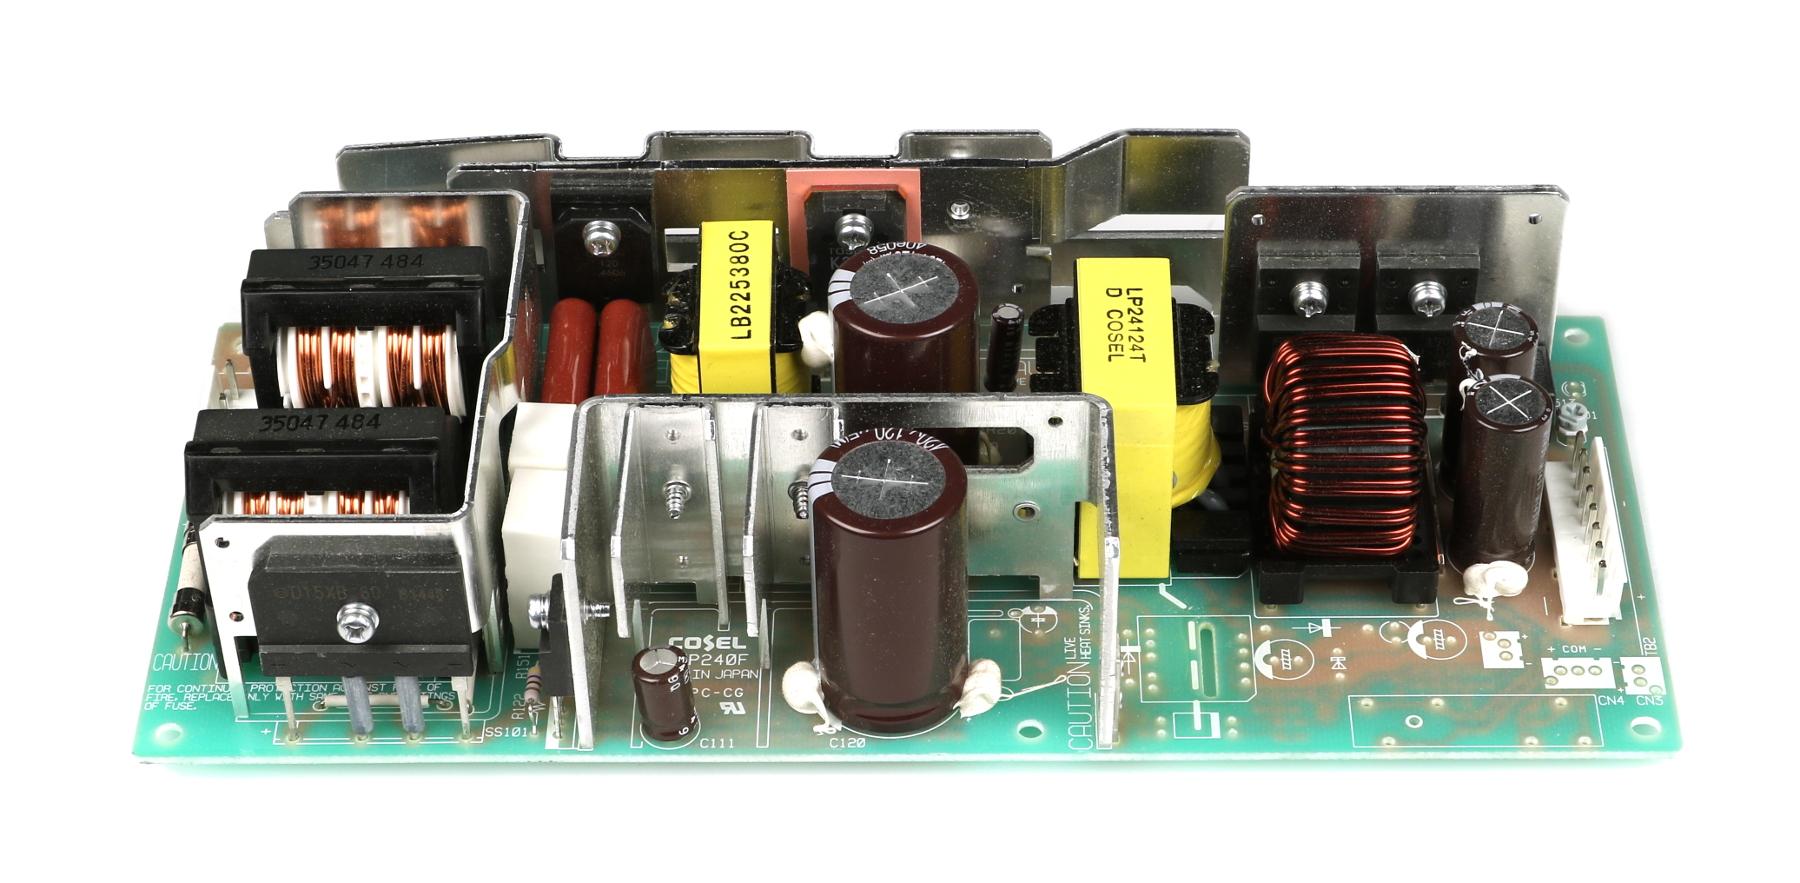 LS9 Power Supply PCB